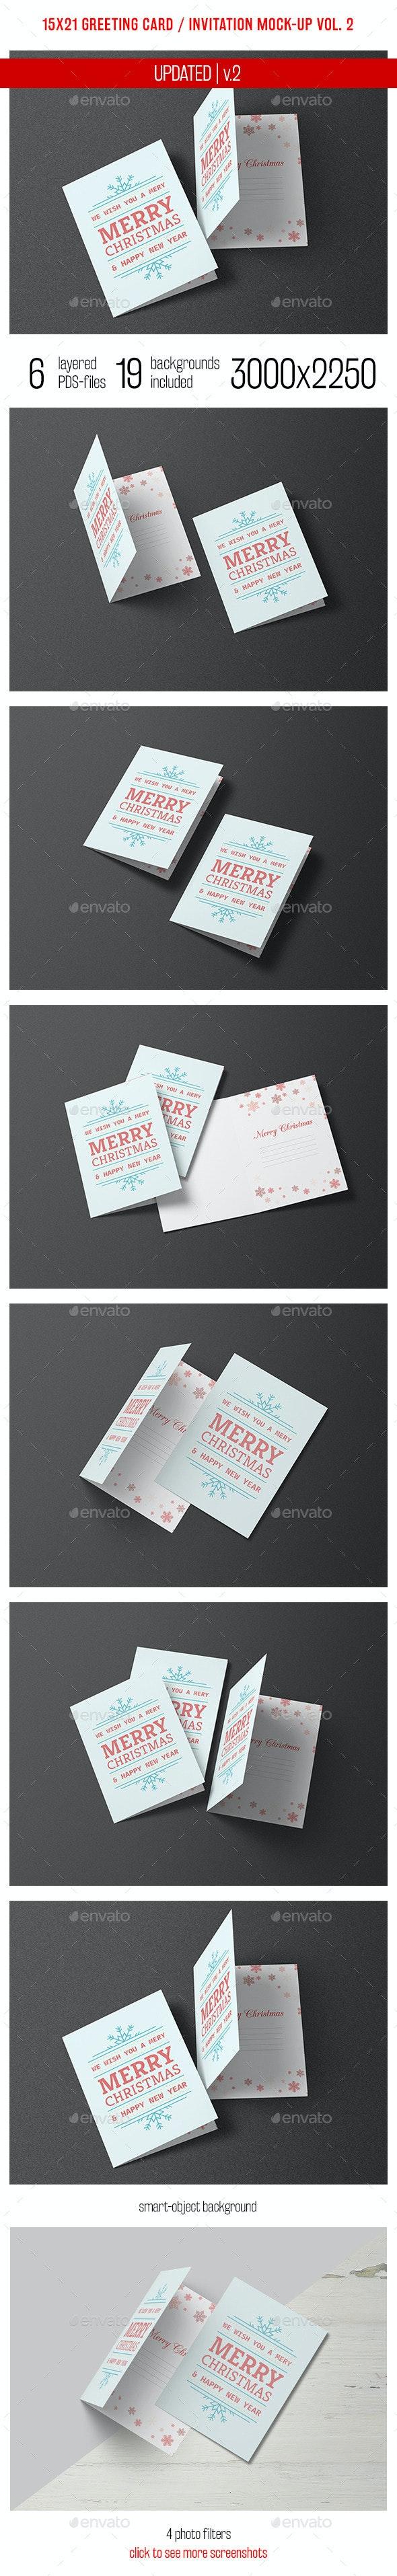 Greeting Card and Invitation Mockup Vol. 2 - Miscellaneous Print